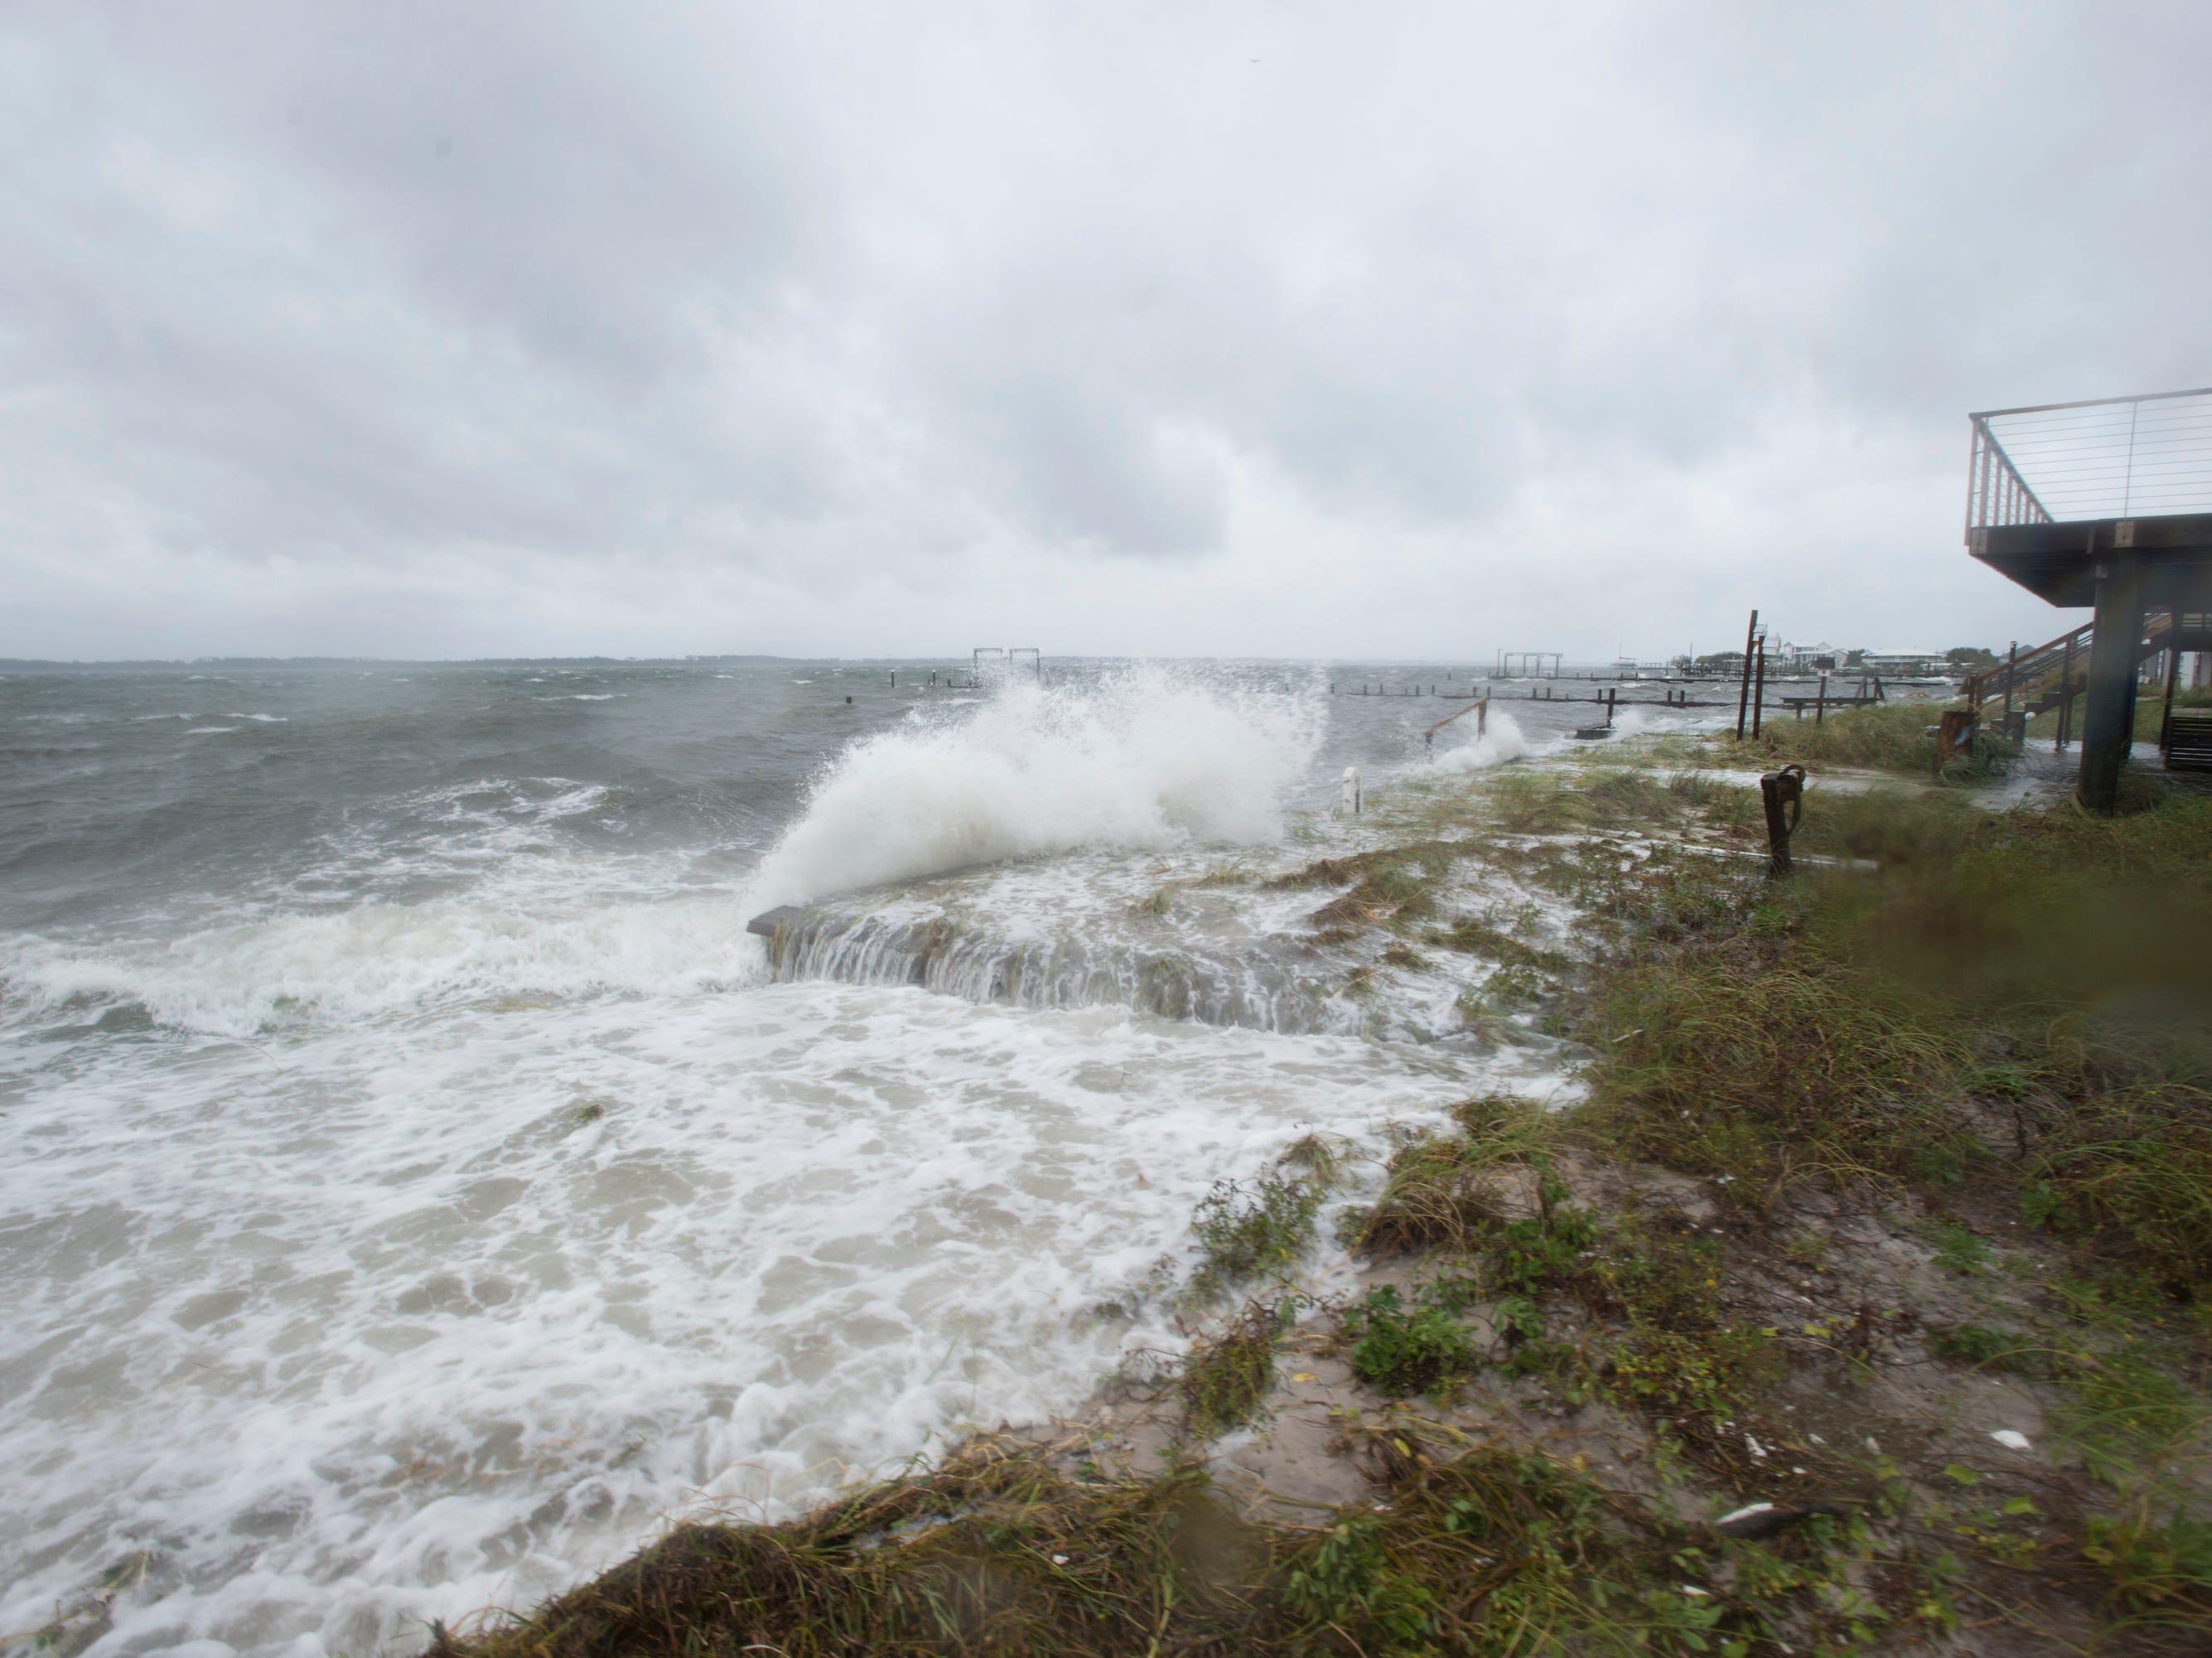 Water crashes the shore along Panferio Drive in Pensacola Beach as Hurricane Michael blows through the area on Wednesday, October 10, 2018.